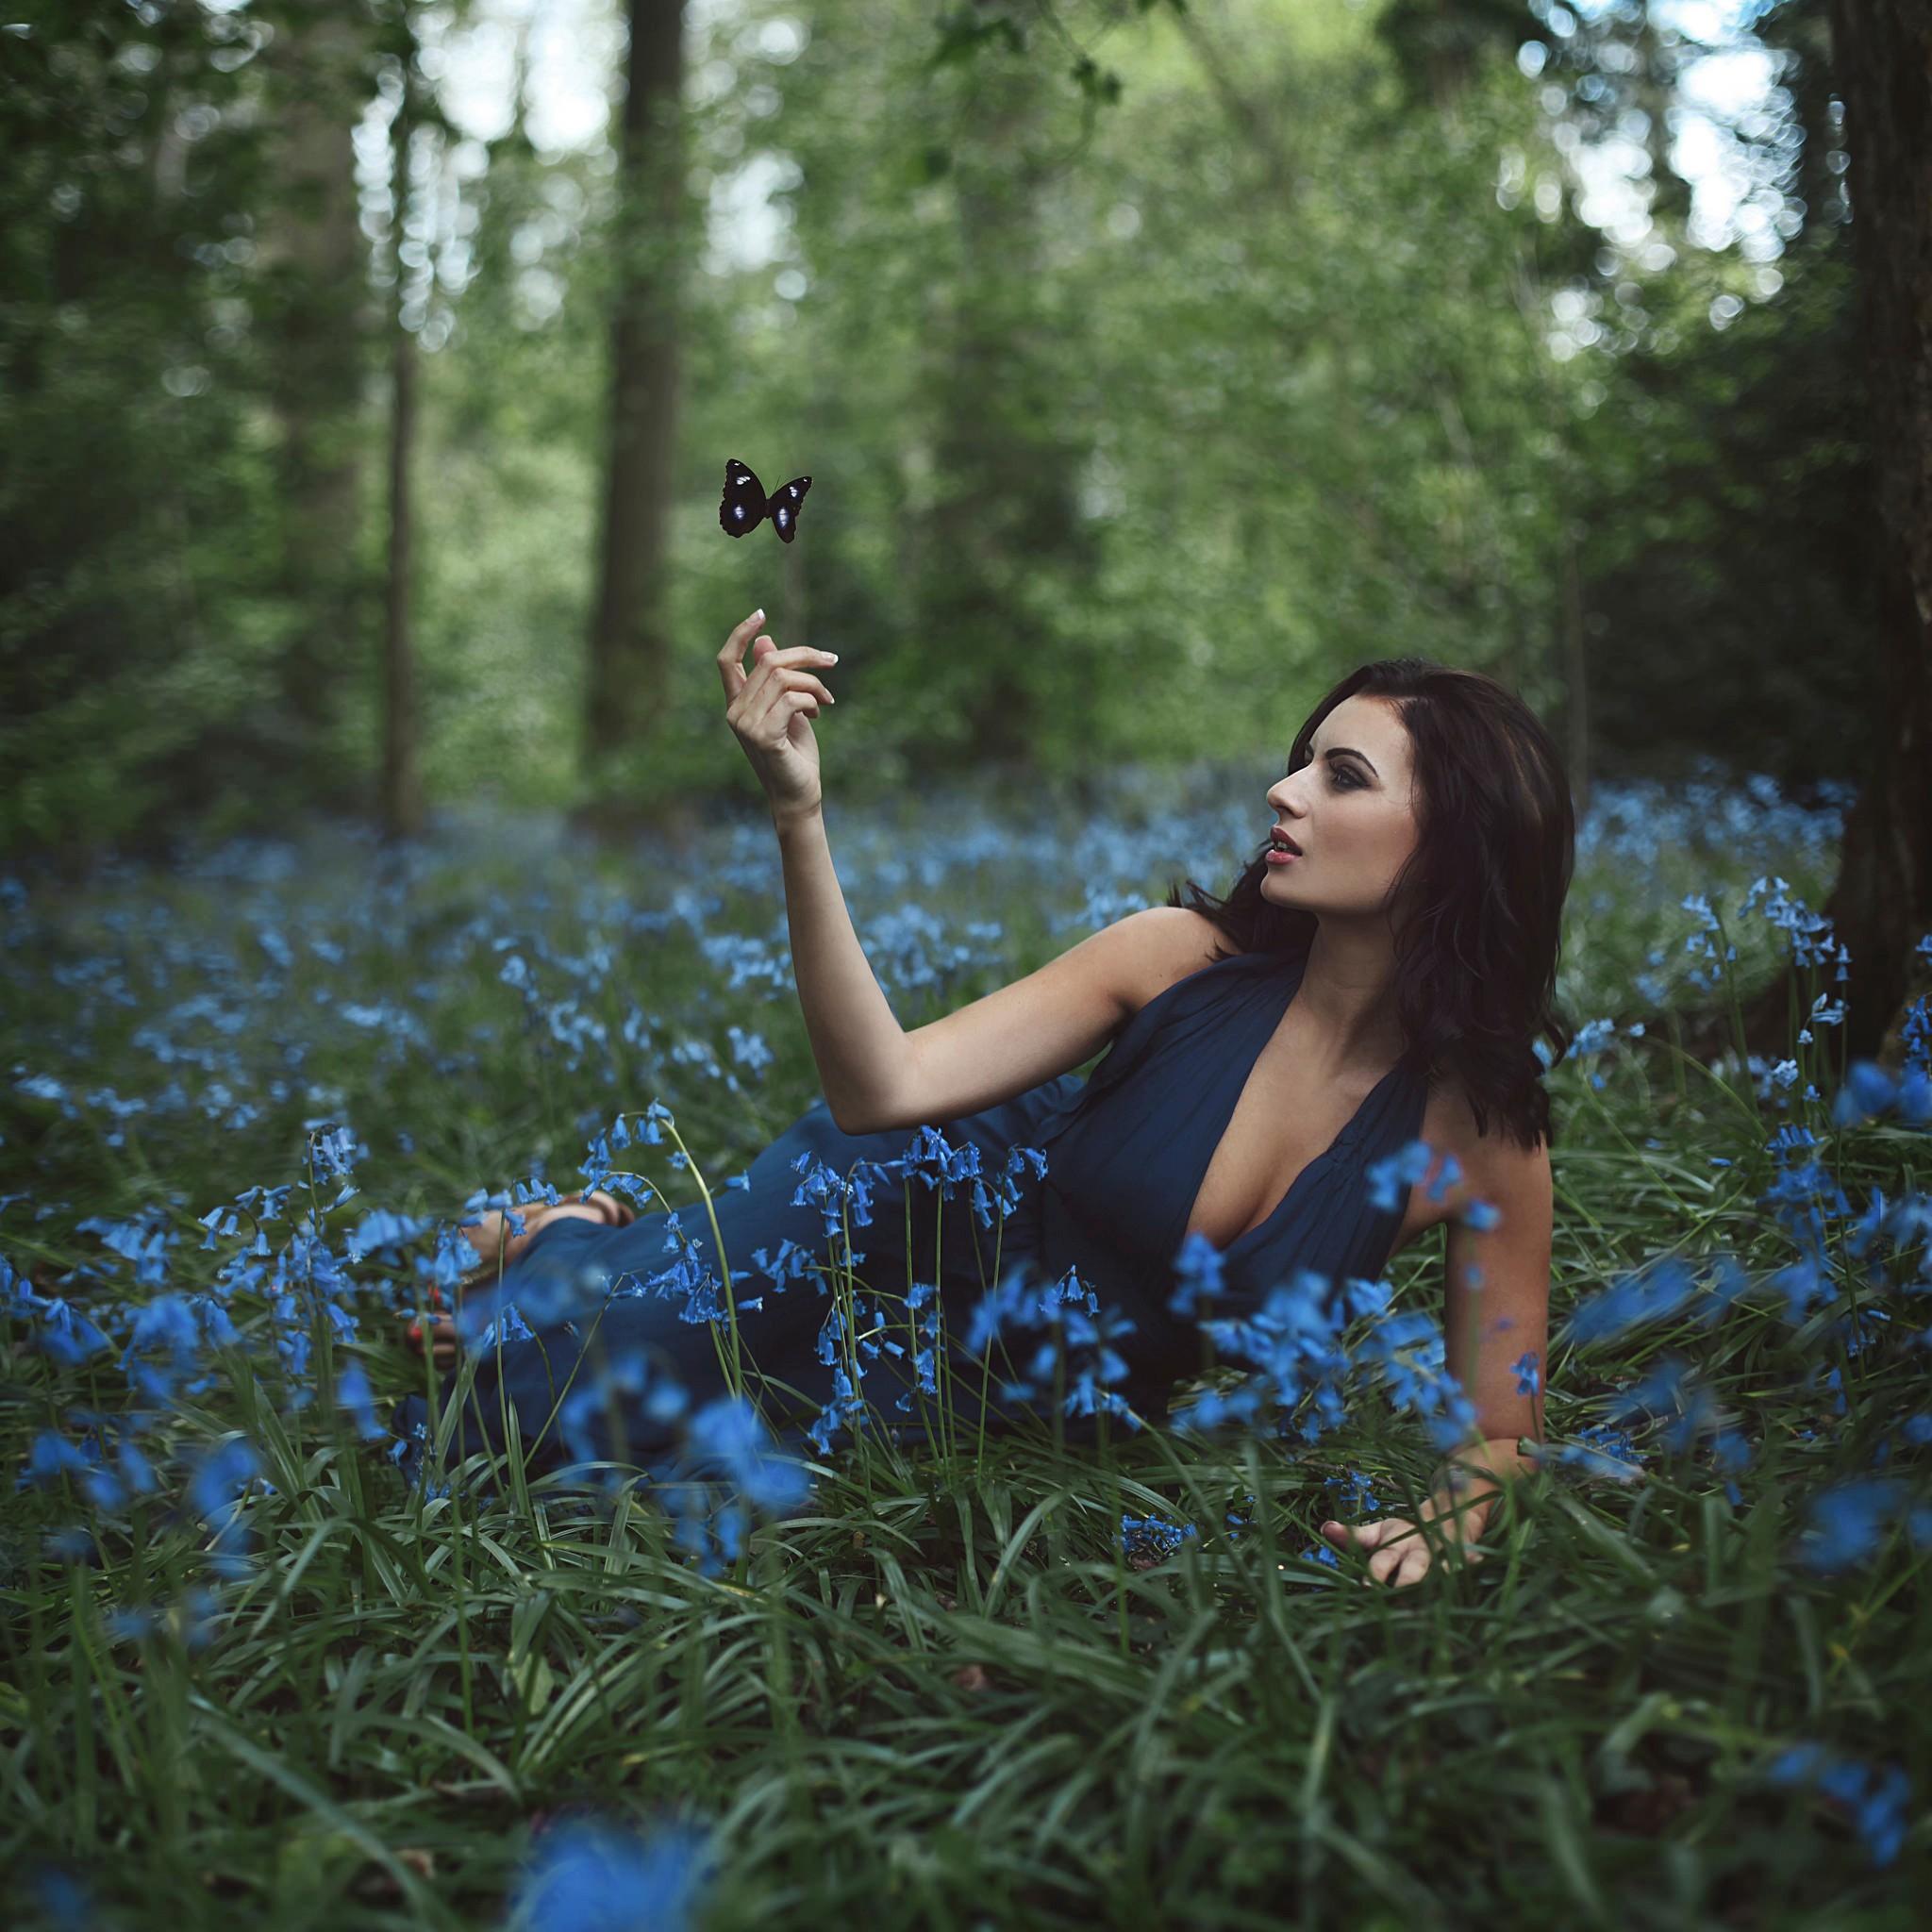 Free Images : girl, woman, petal, photo, model, spring ...